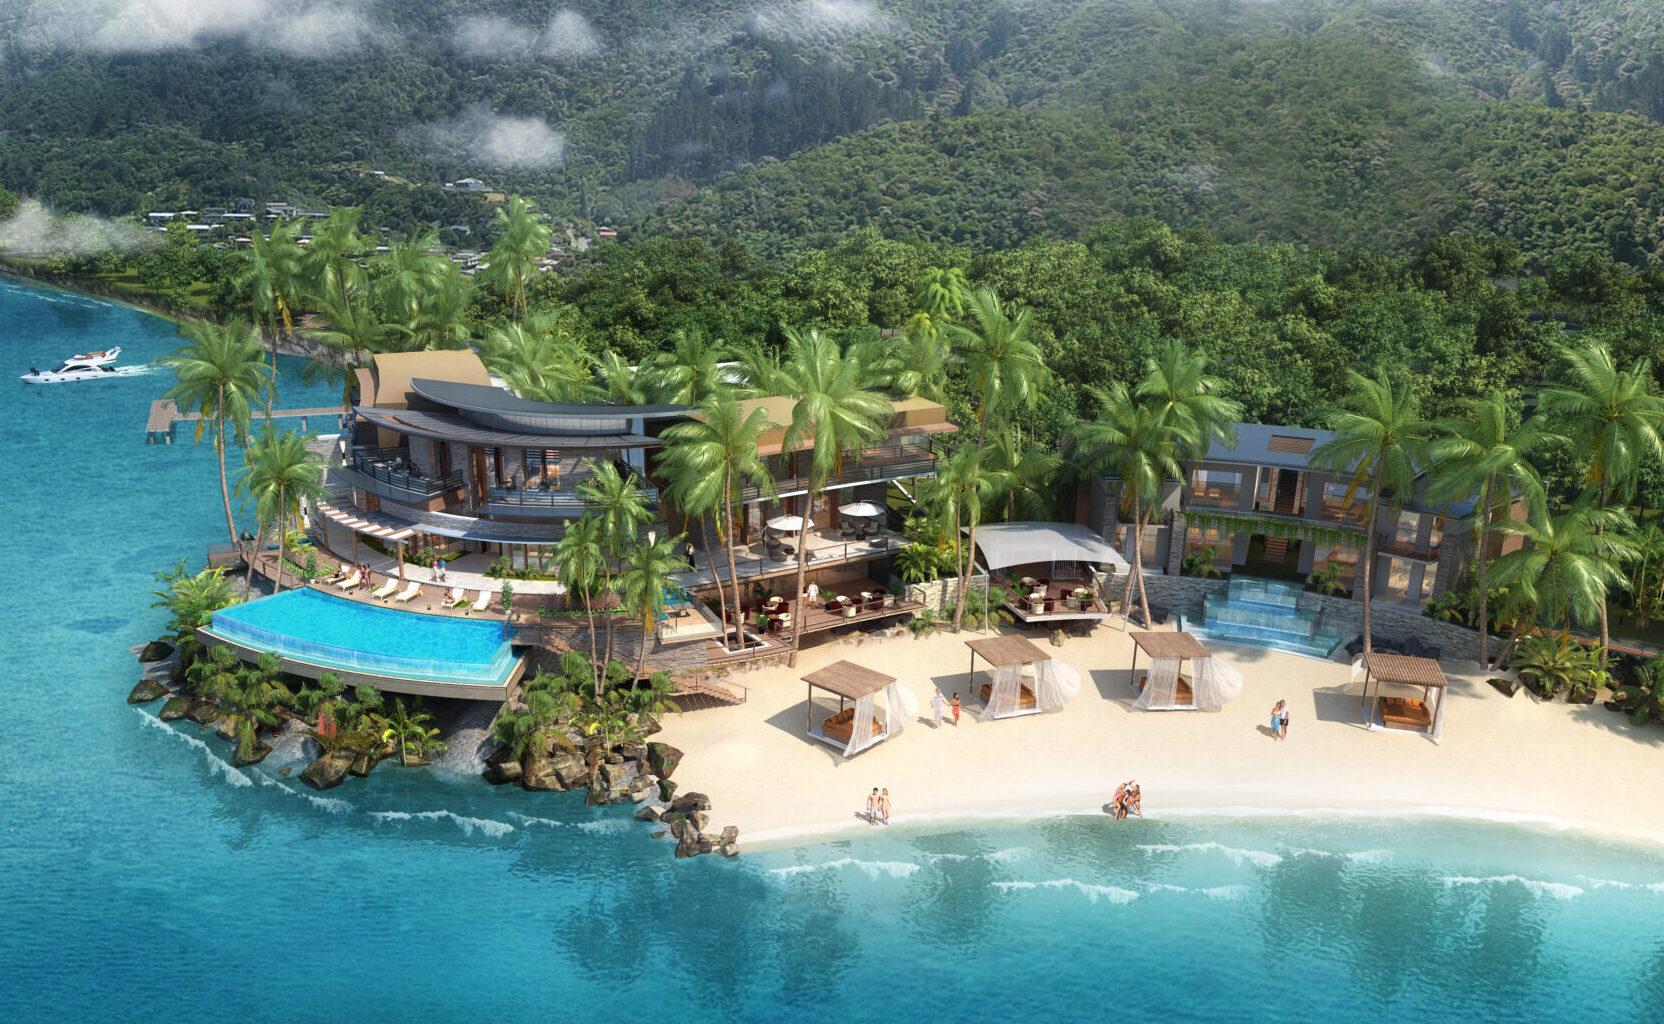 LXR-by-Hilton-Seychelles1-scaled-e1593848416309-2